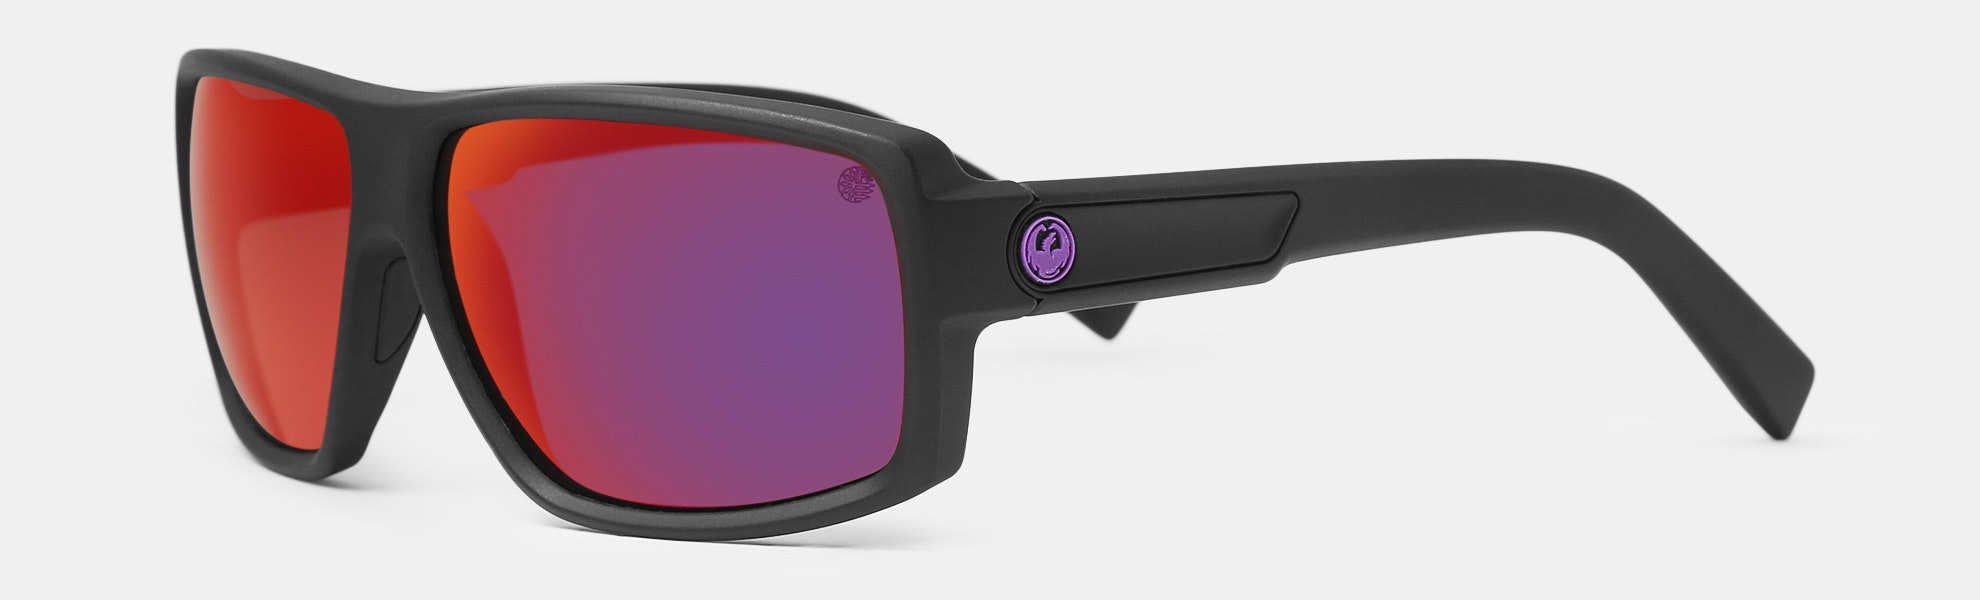 Dragon Alliance Floatable Polarized Sunglasses